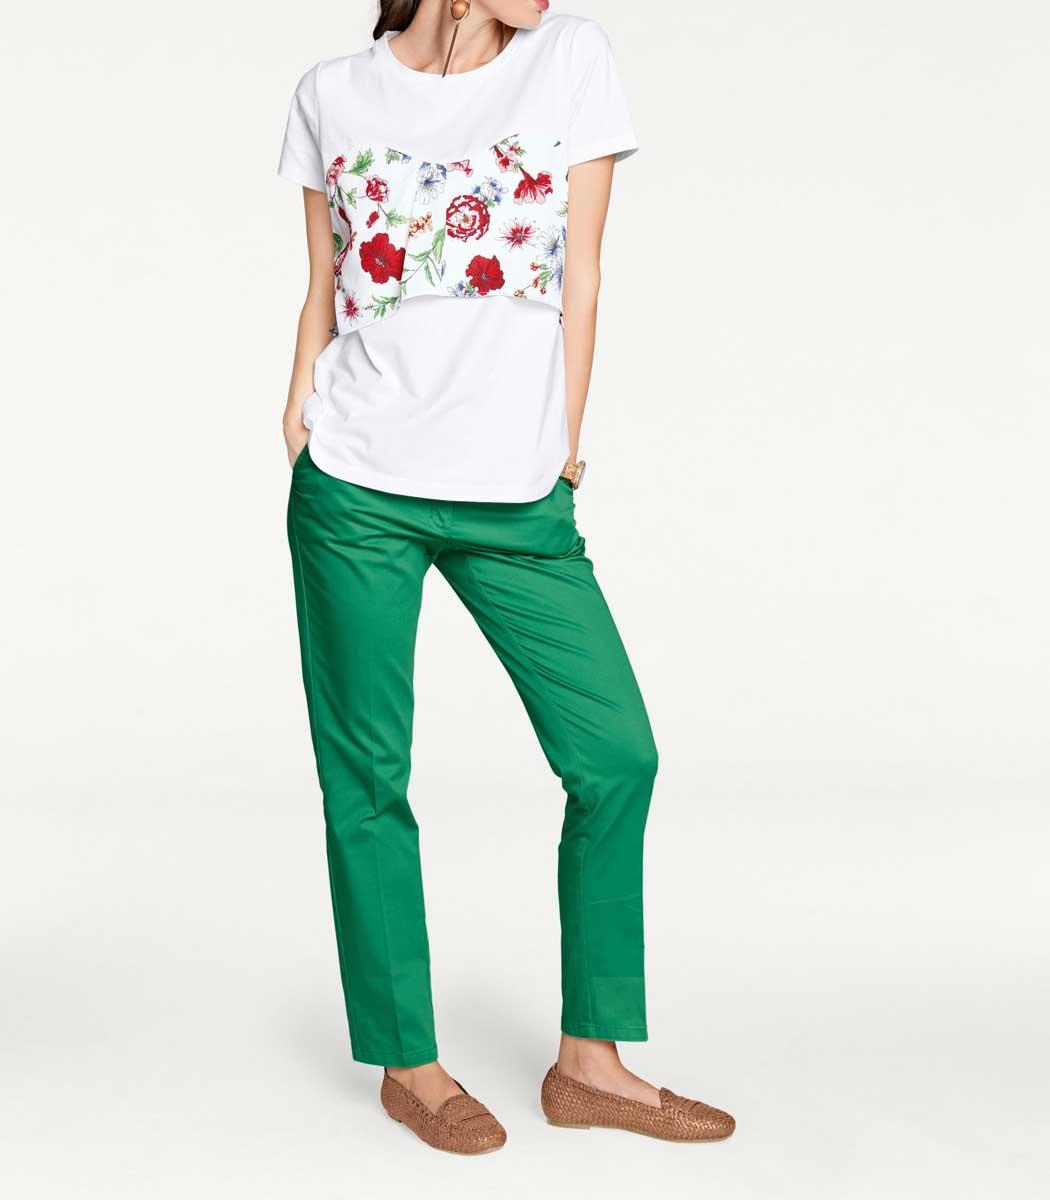 243.287 RICK CARDONA Damen Designer-Shirt Weiß-Bunt